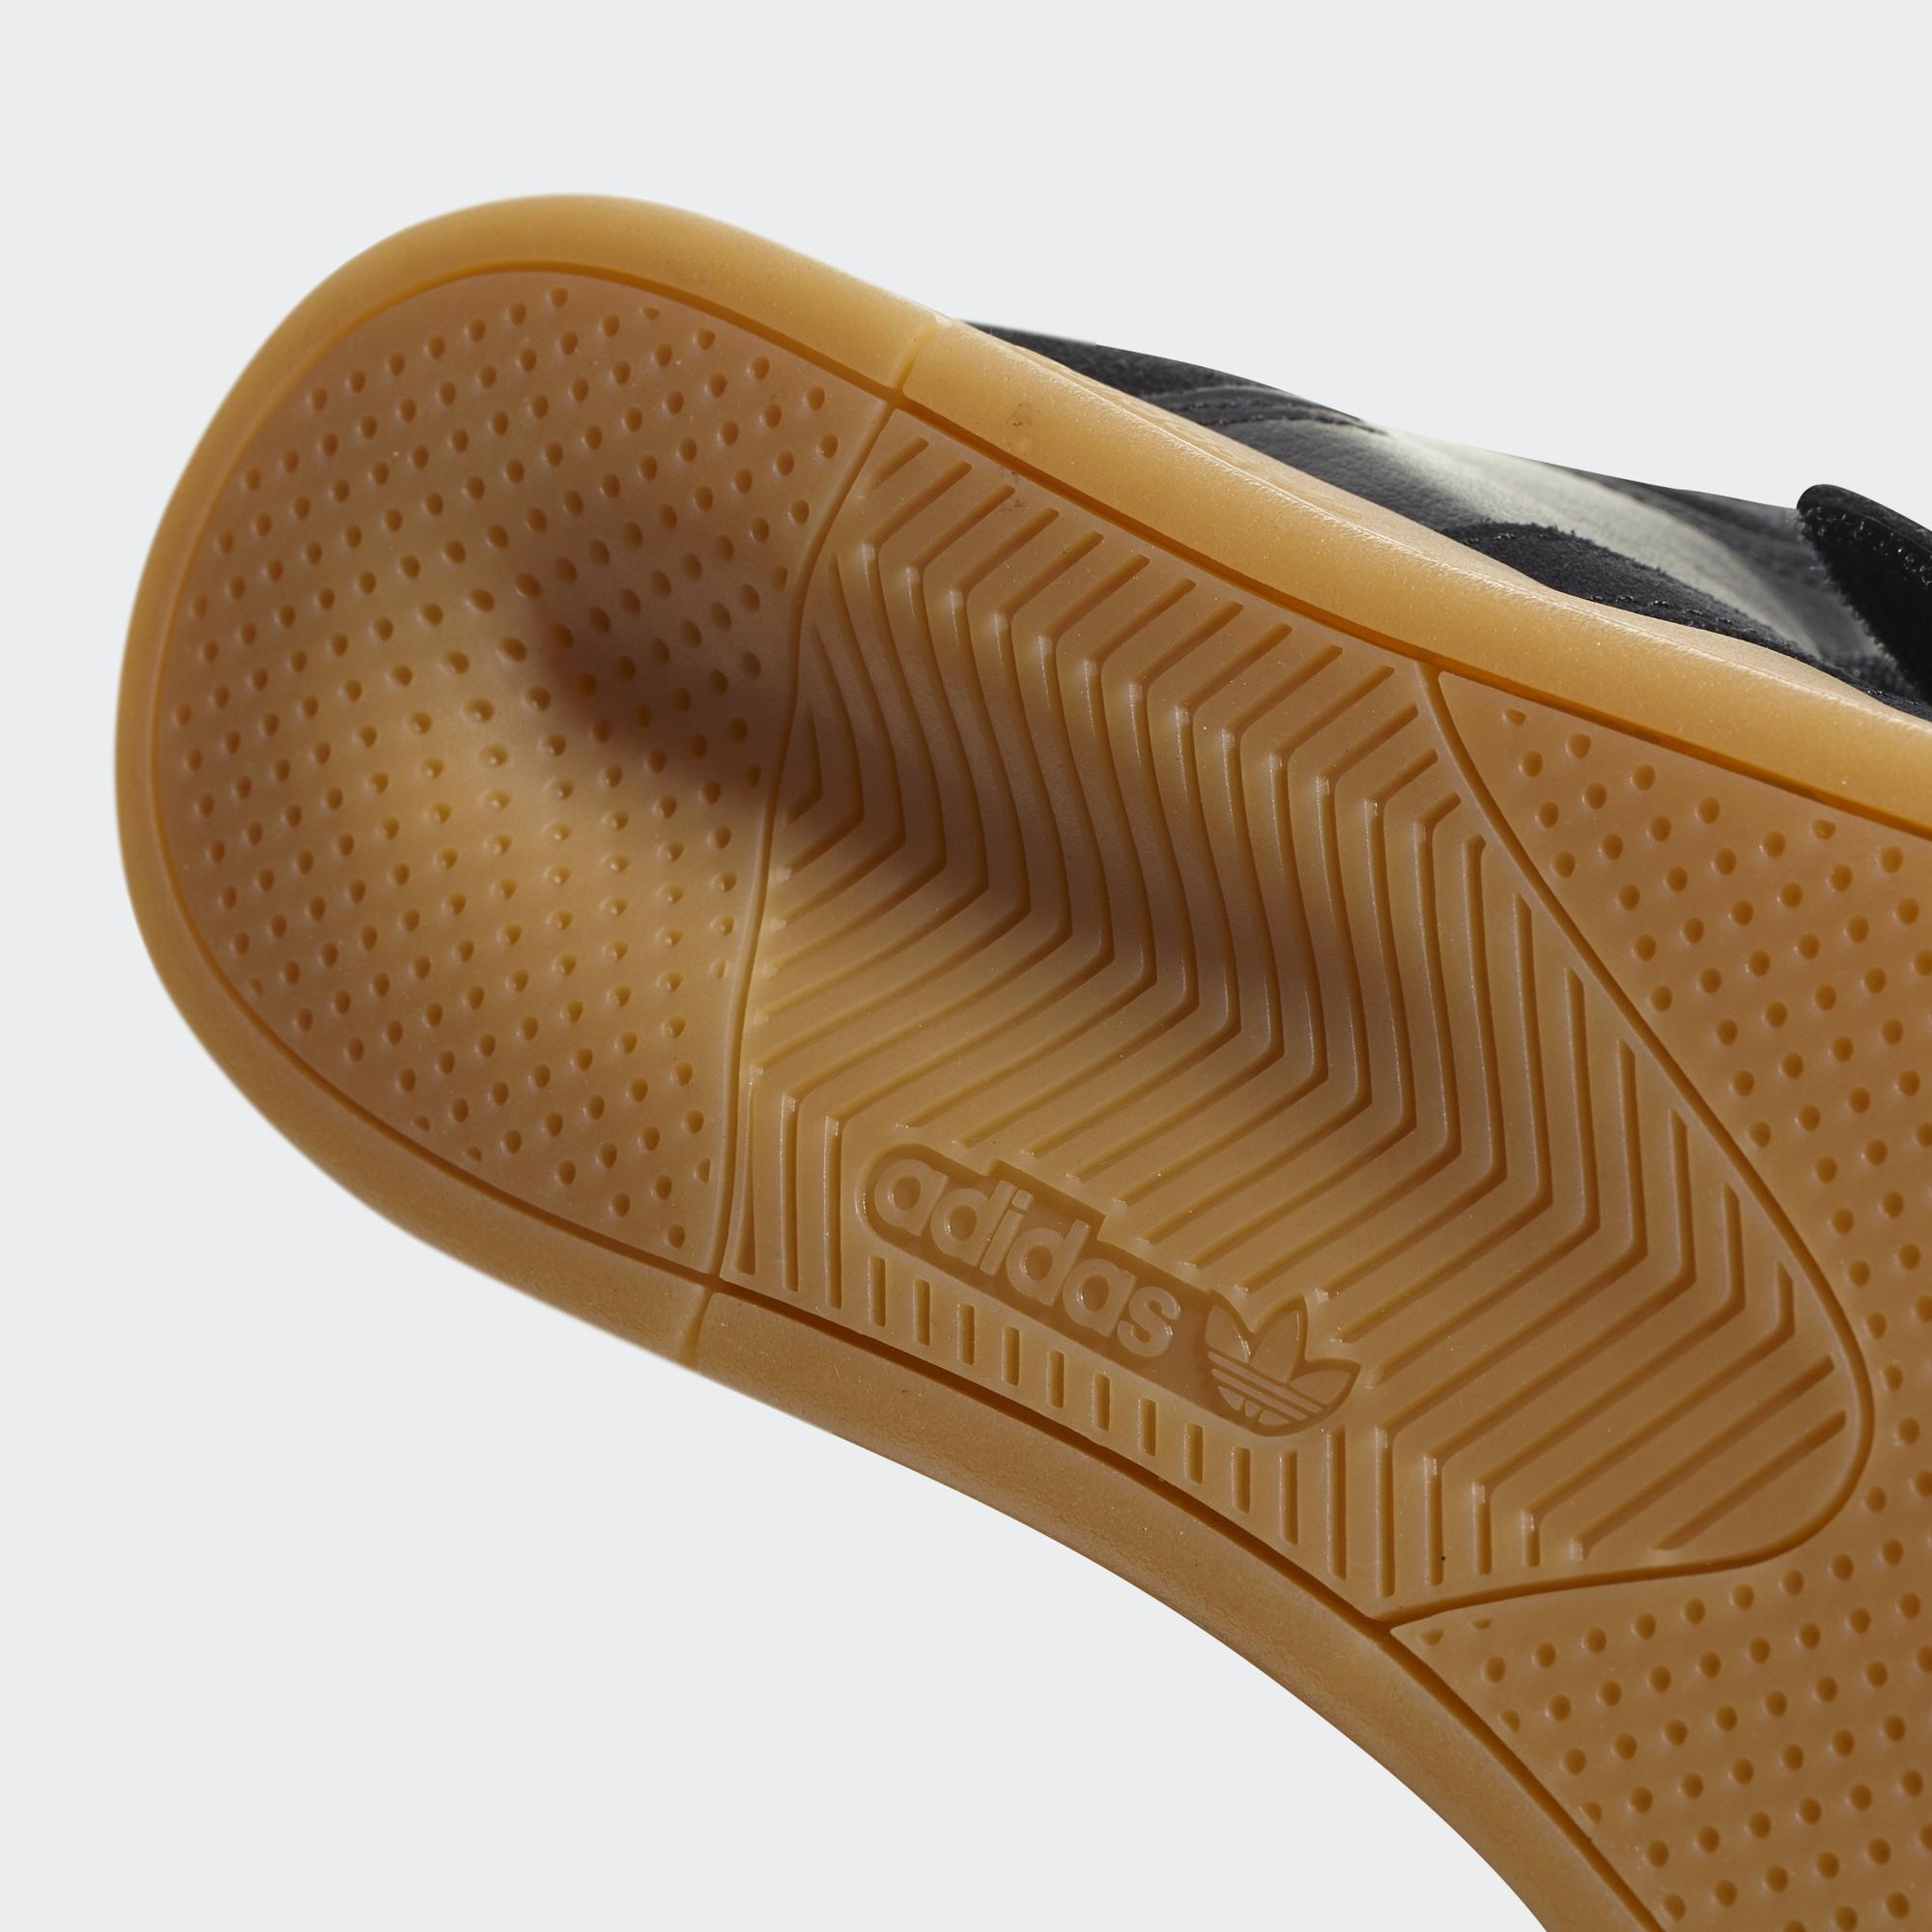 3d985fd793f8c Pánske tenisky Adidas Originals Tubular Invader Strap BY3630